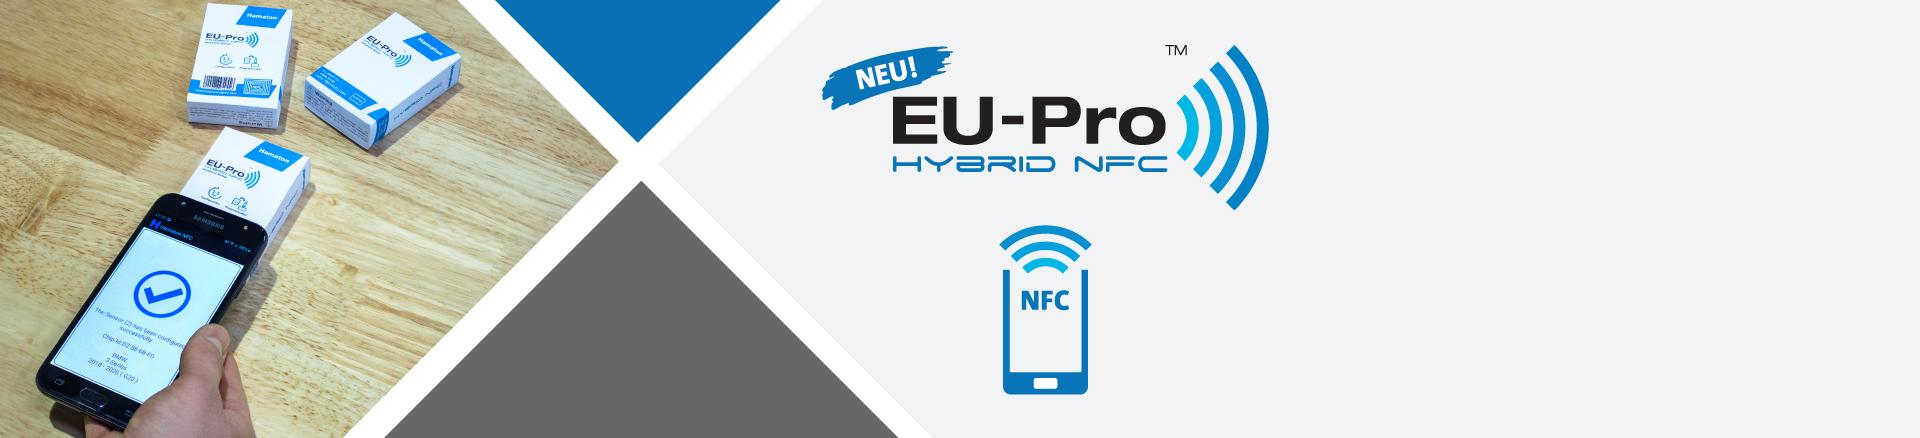 EU-Pro Hybrid NFC